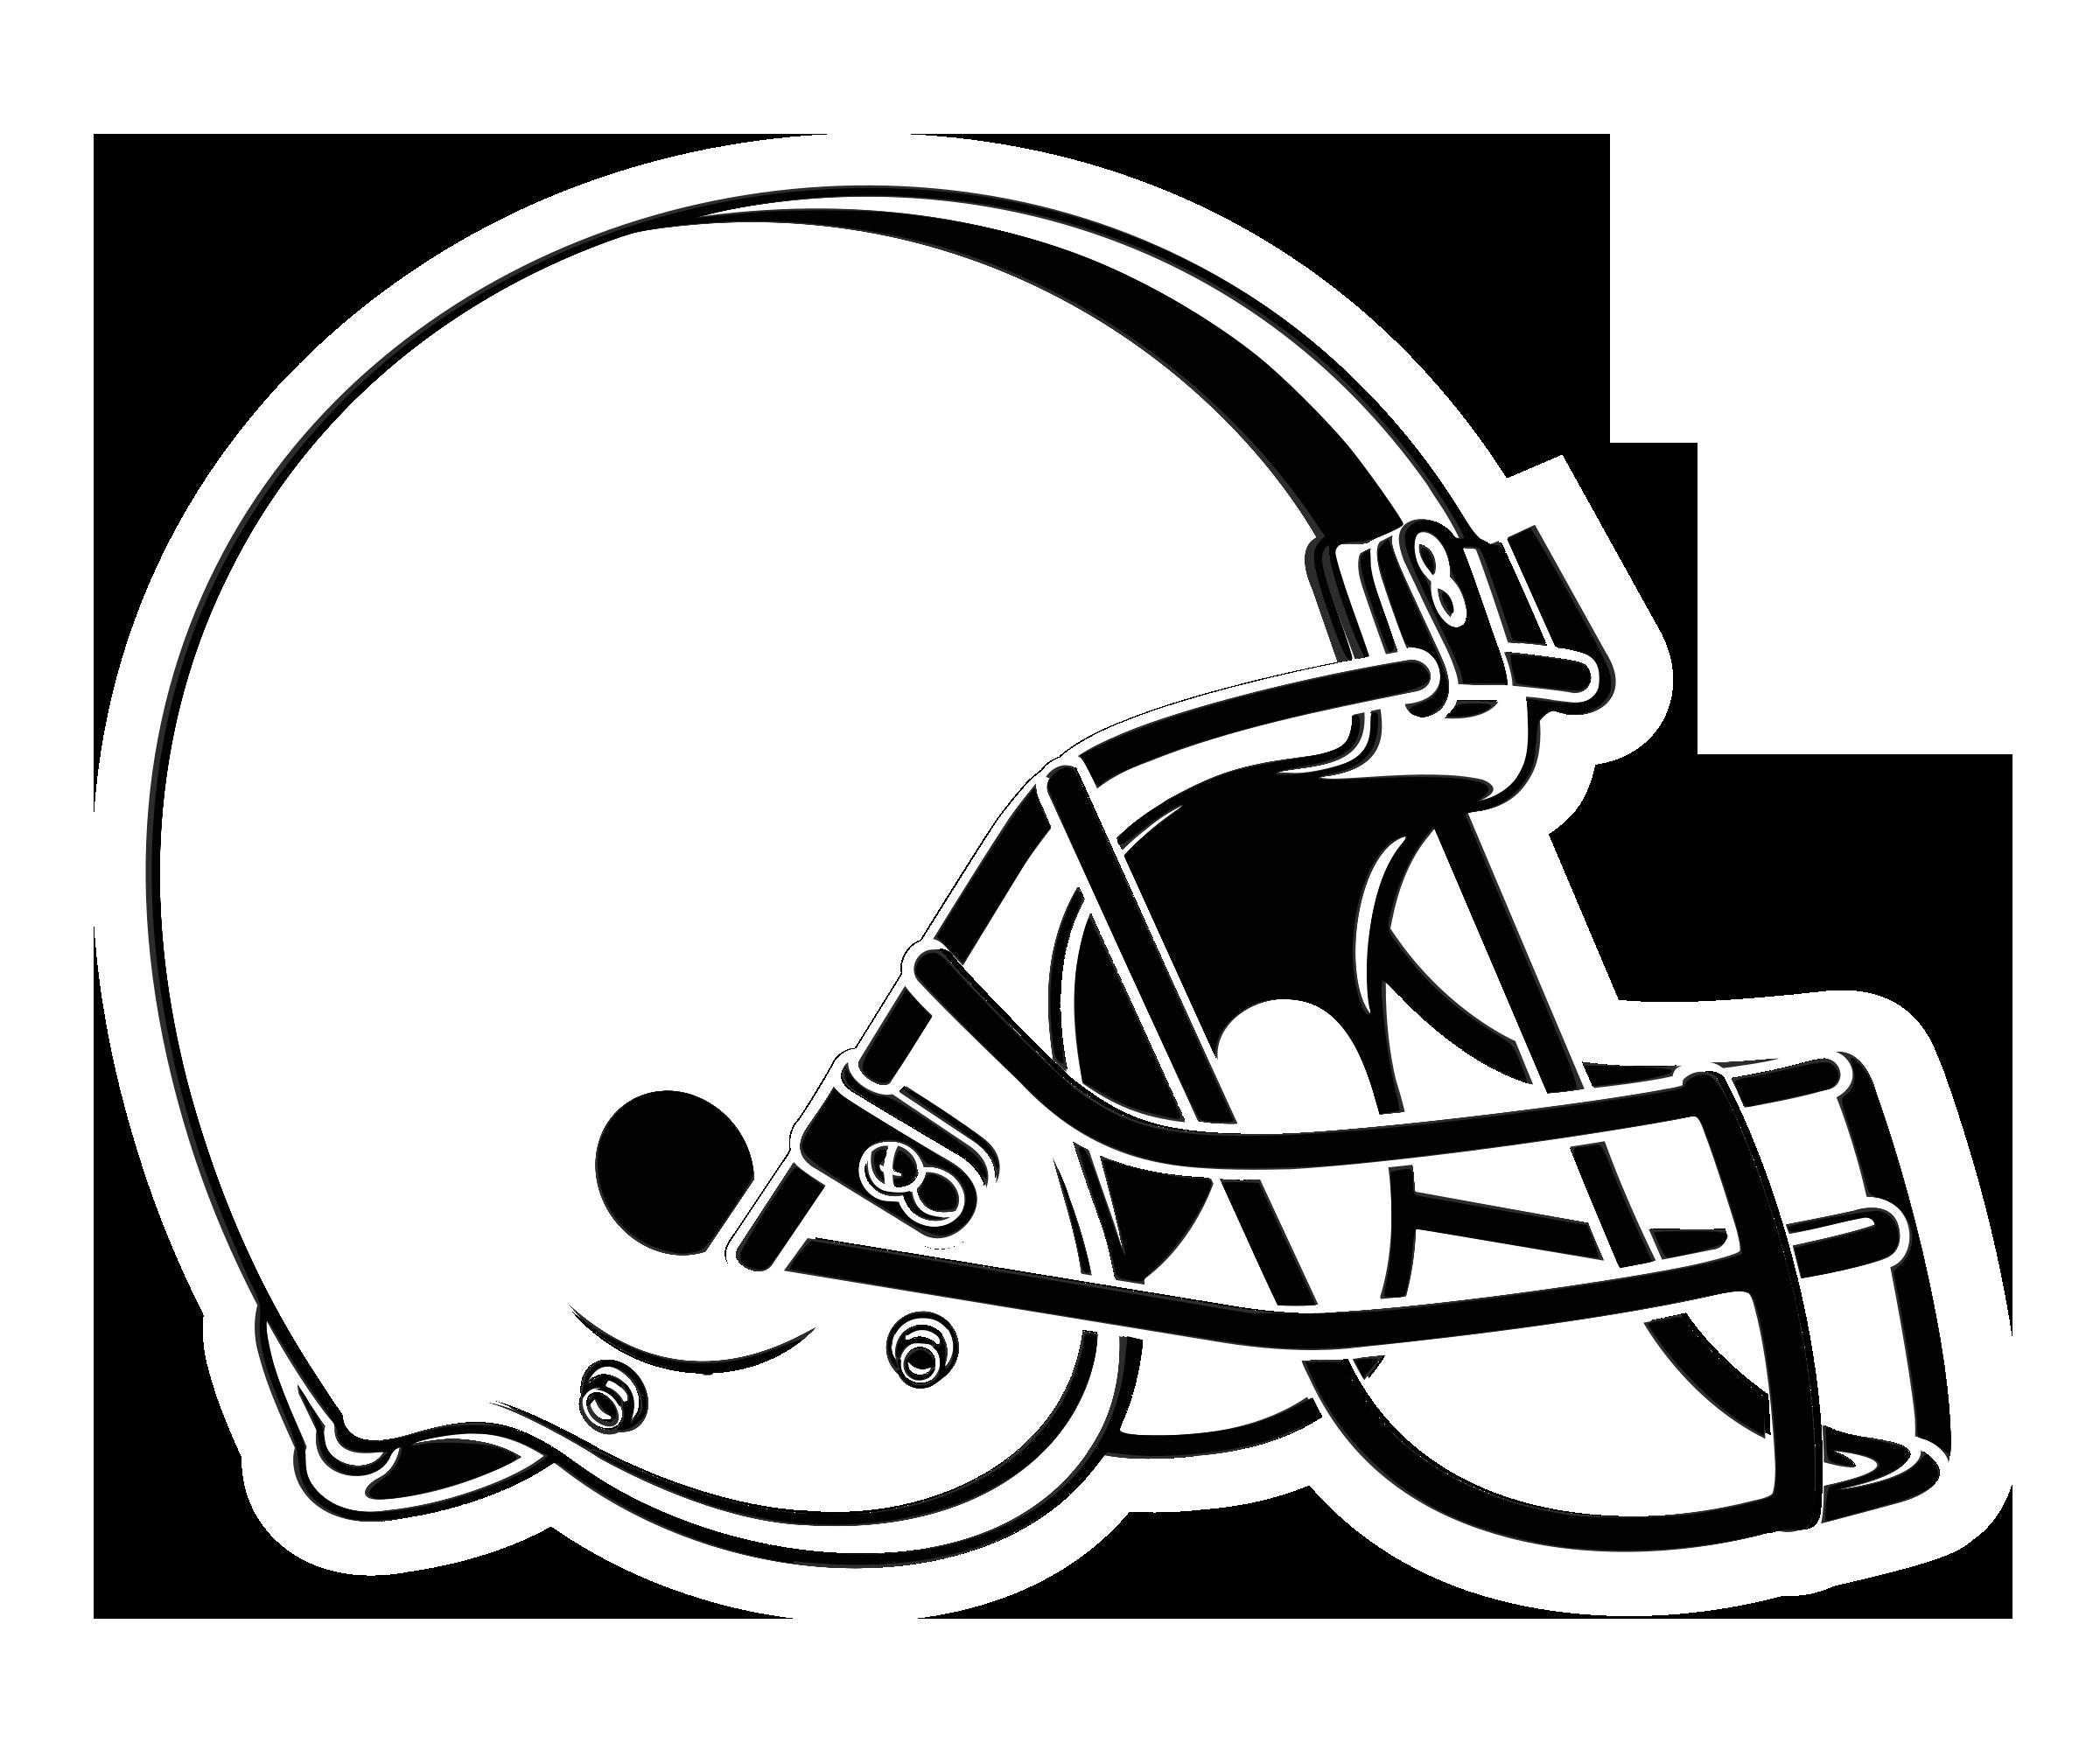 Cleveland browns helmet black and white clipart jpg transparent stock Helmet,Sports gear,Football helmet,Football gear,Clothing,Personal ... jpg transparent stock